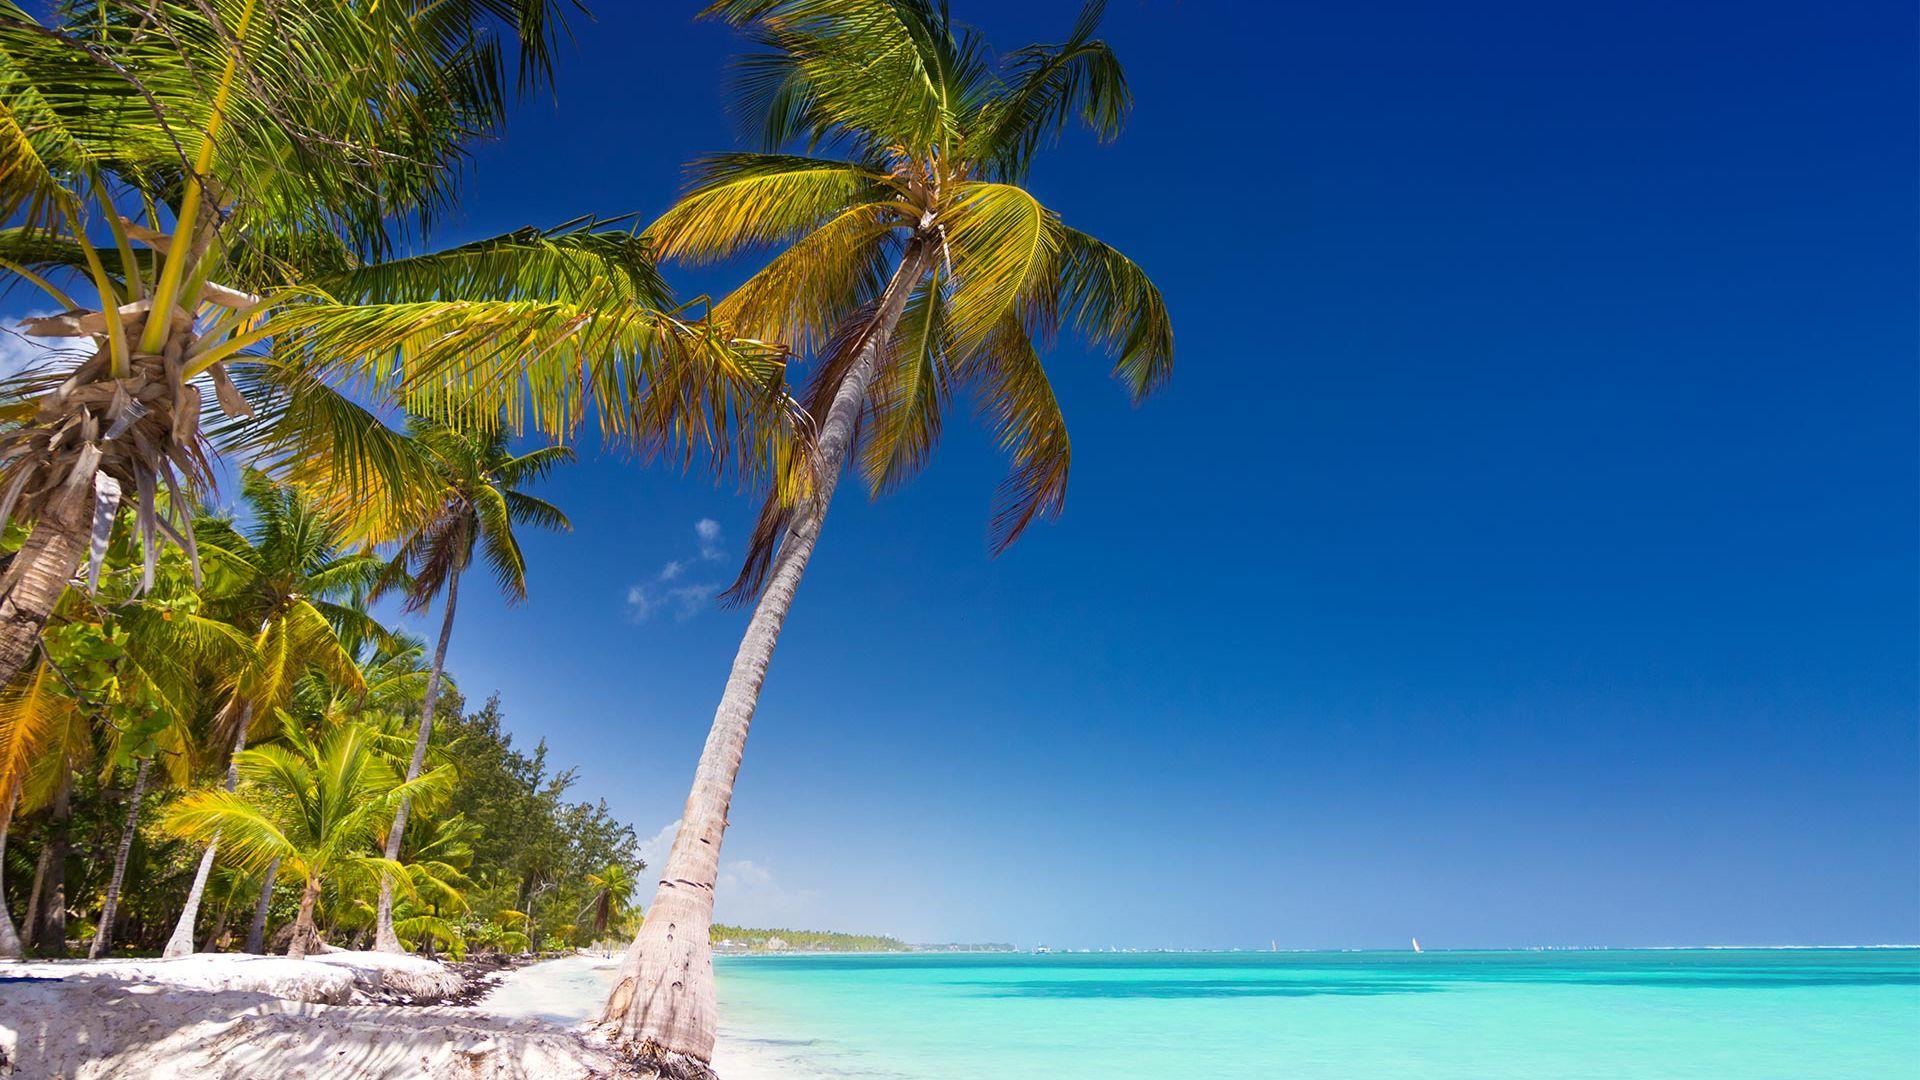 Oferta Speciala - Sejur plaja Punta Cana, Republica Dominicana, 9 zile - 6 iulie 2021